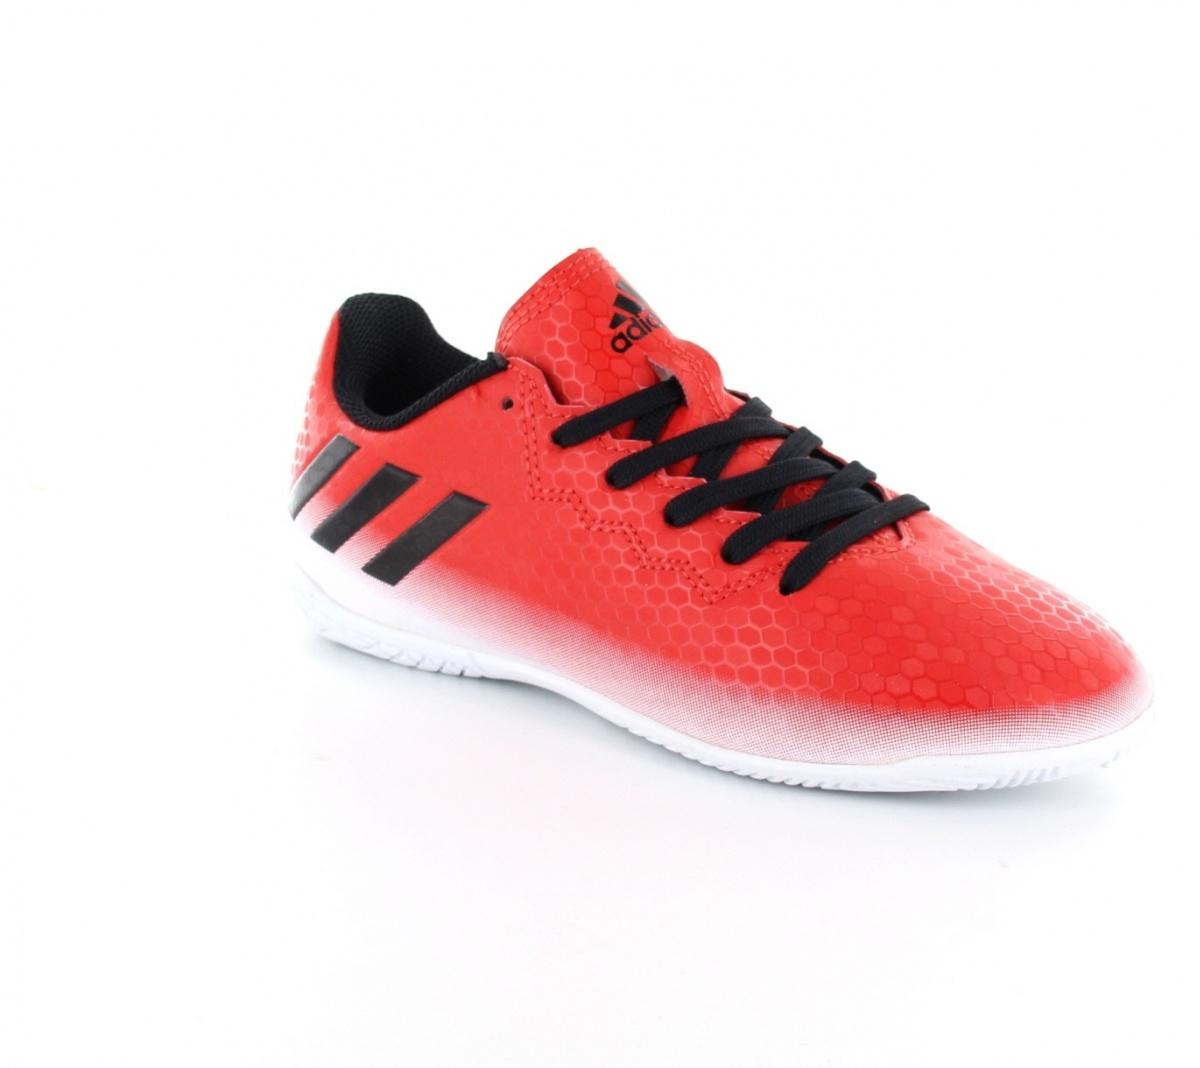 Tênis Adidas Messi 16.4 Futsal Infantil Tênis Adidas Messi 16.4 Futsal  Infantil ... d0785d17d6788